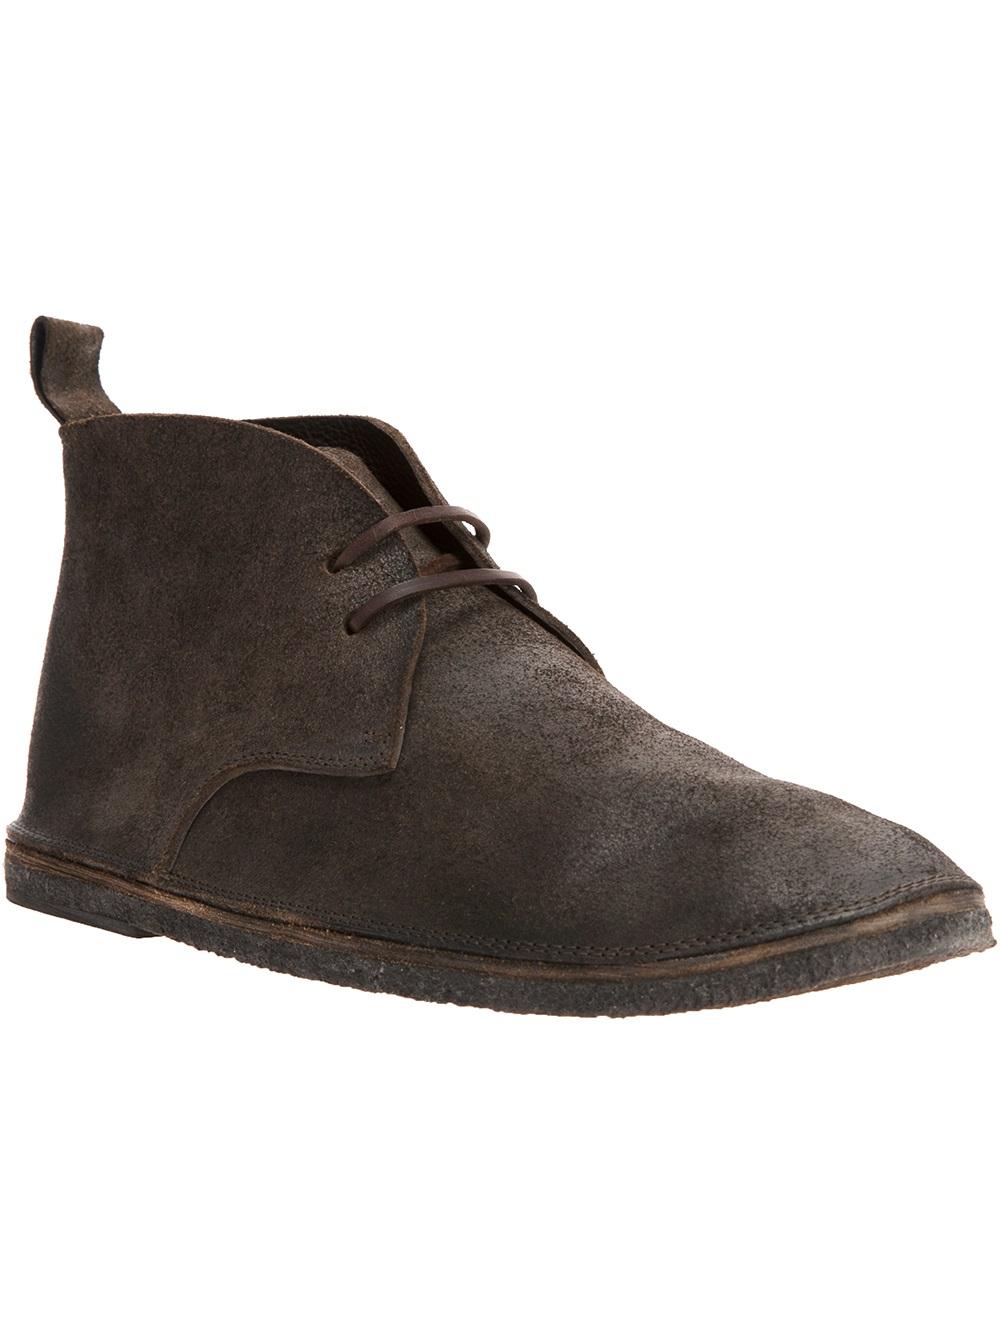 Marsall Desert Boots En Détresse - Brun Bg1qFp